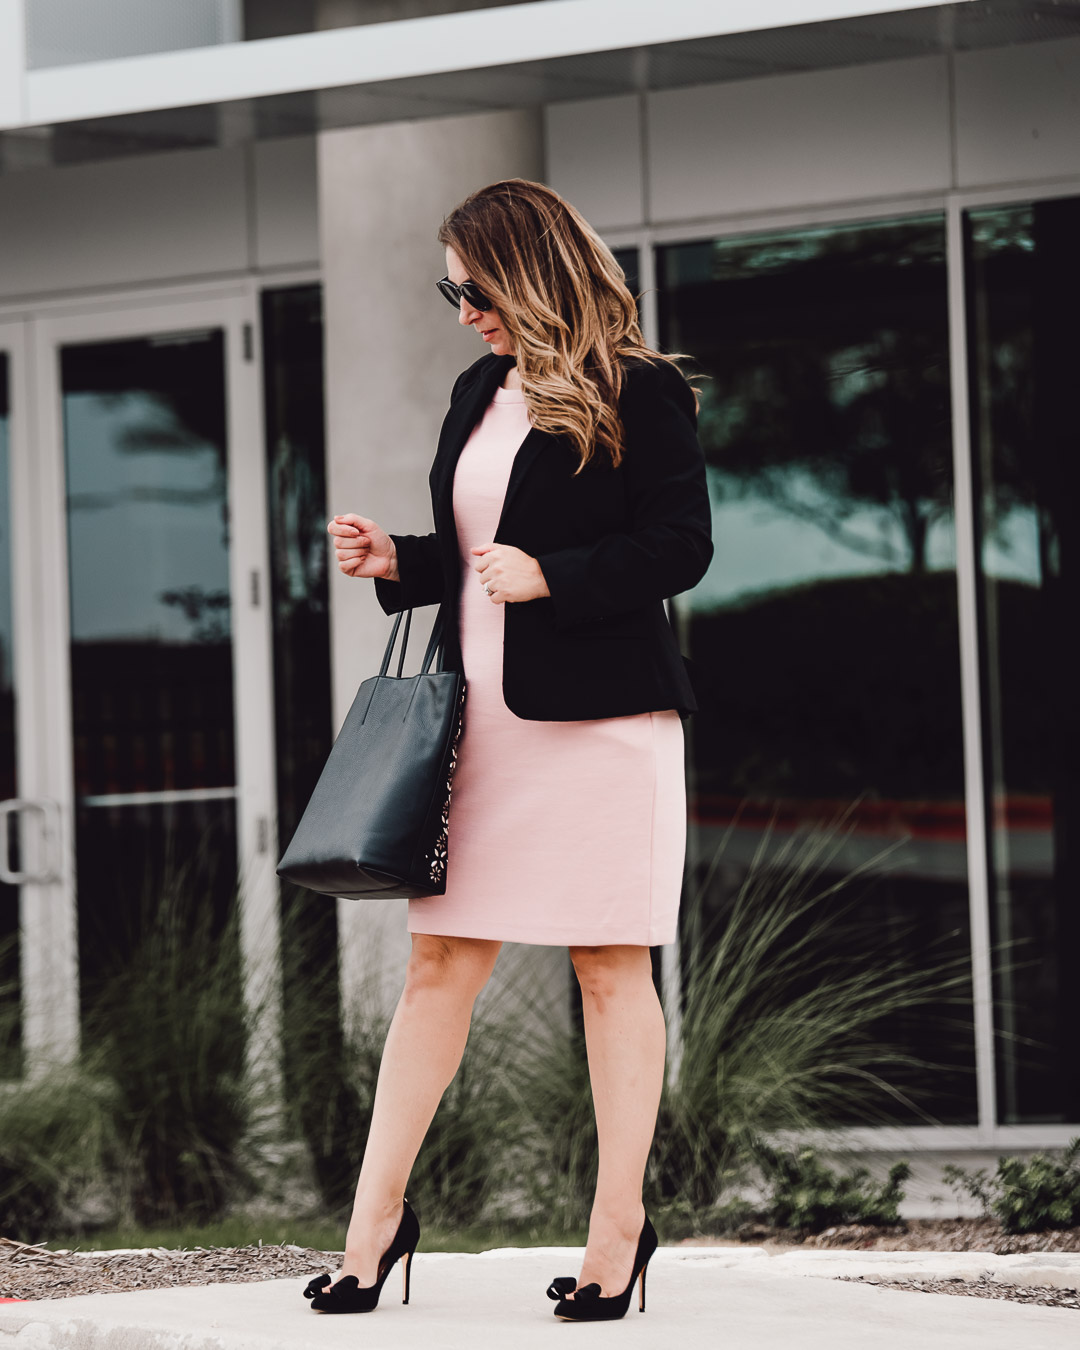 Professional dress in sized 10/12. Boden, Ann Taylor, Ted Baker #pinkdress #professionaldress #corporatedress